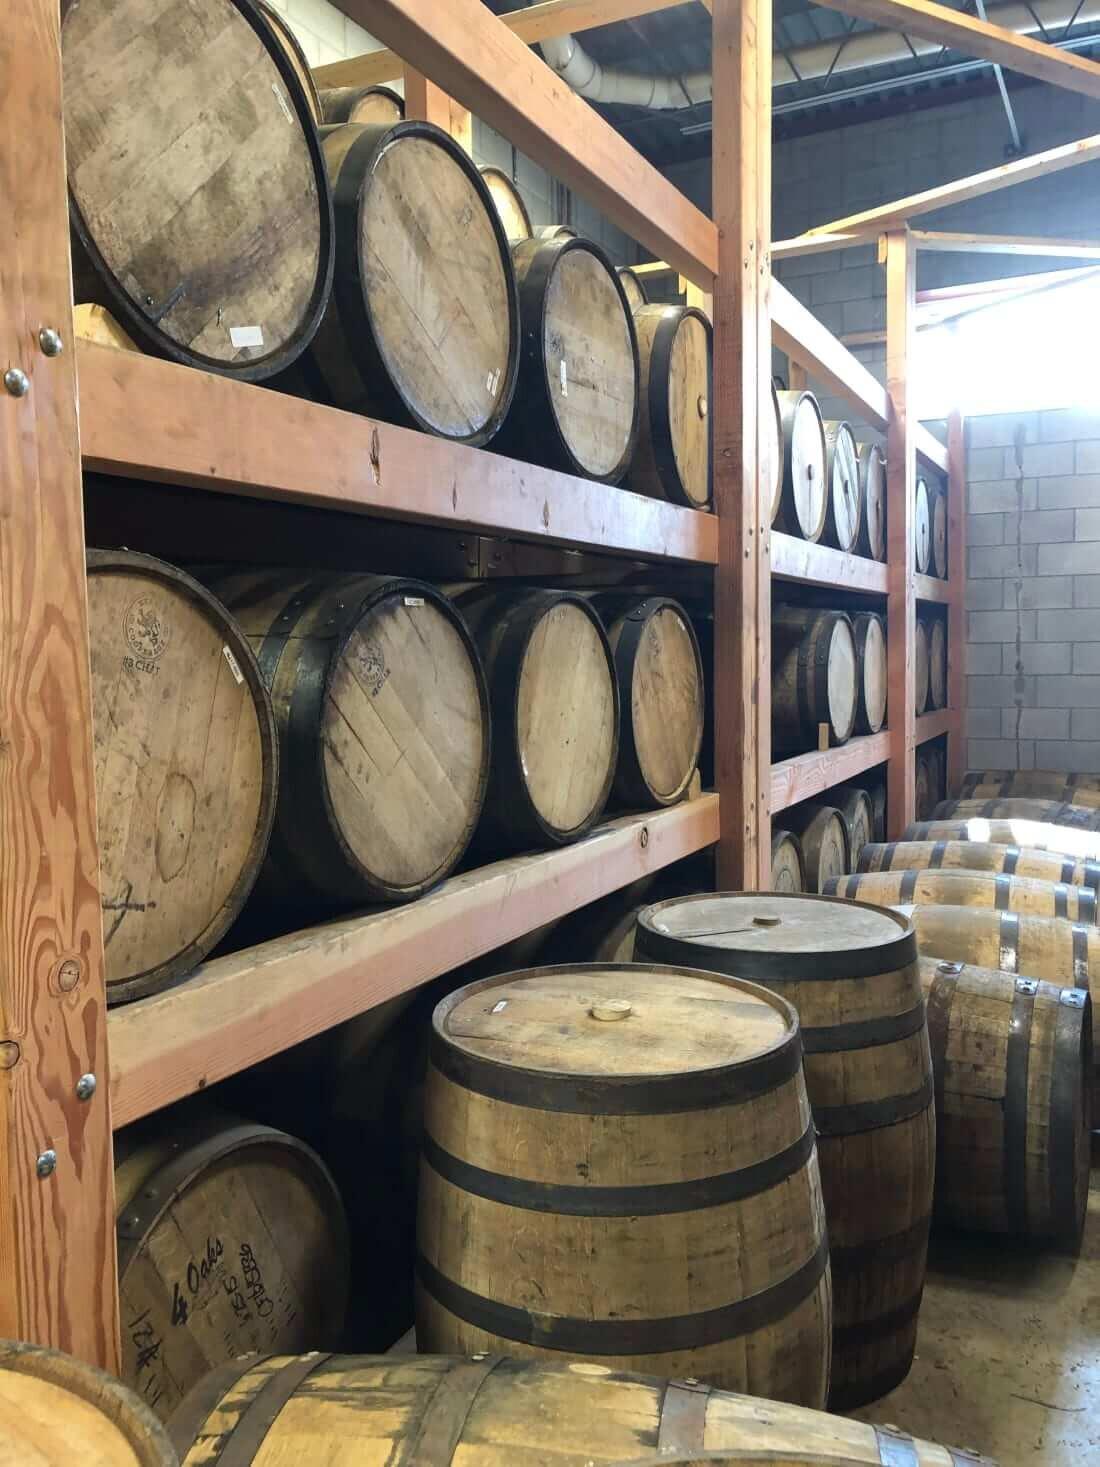 Oak whiskey barrels at Traverse City Whiskey Co.